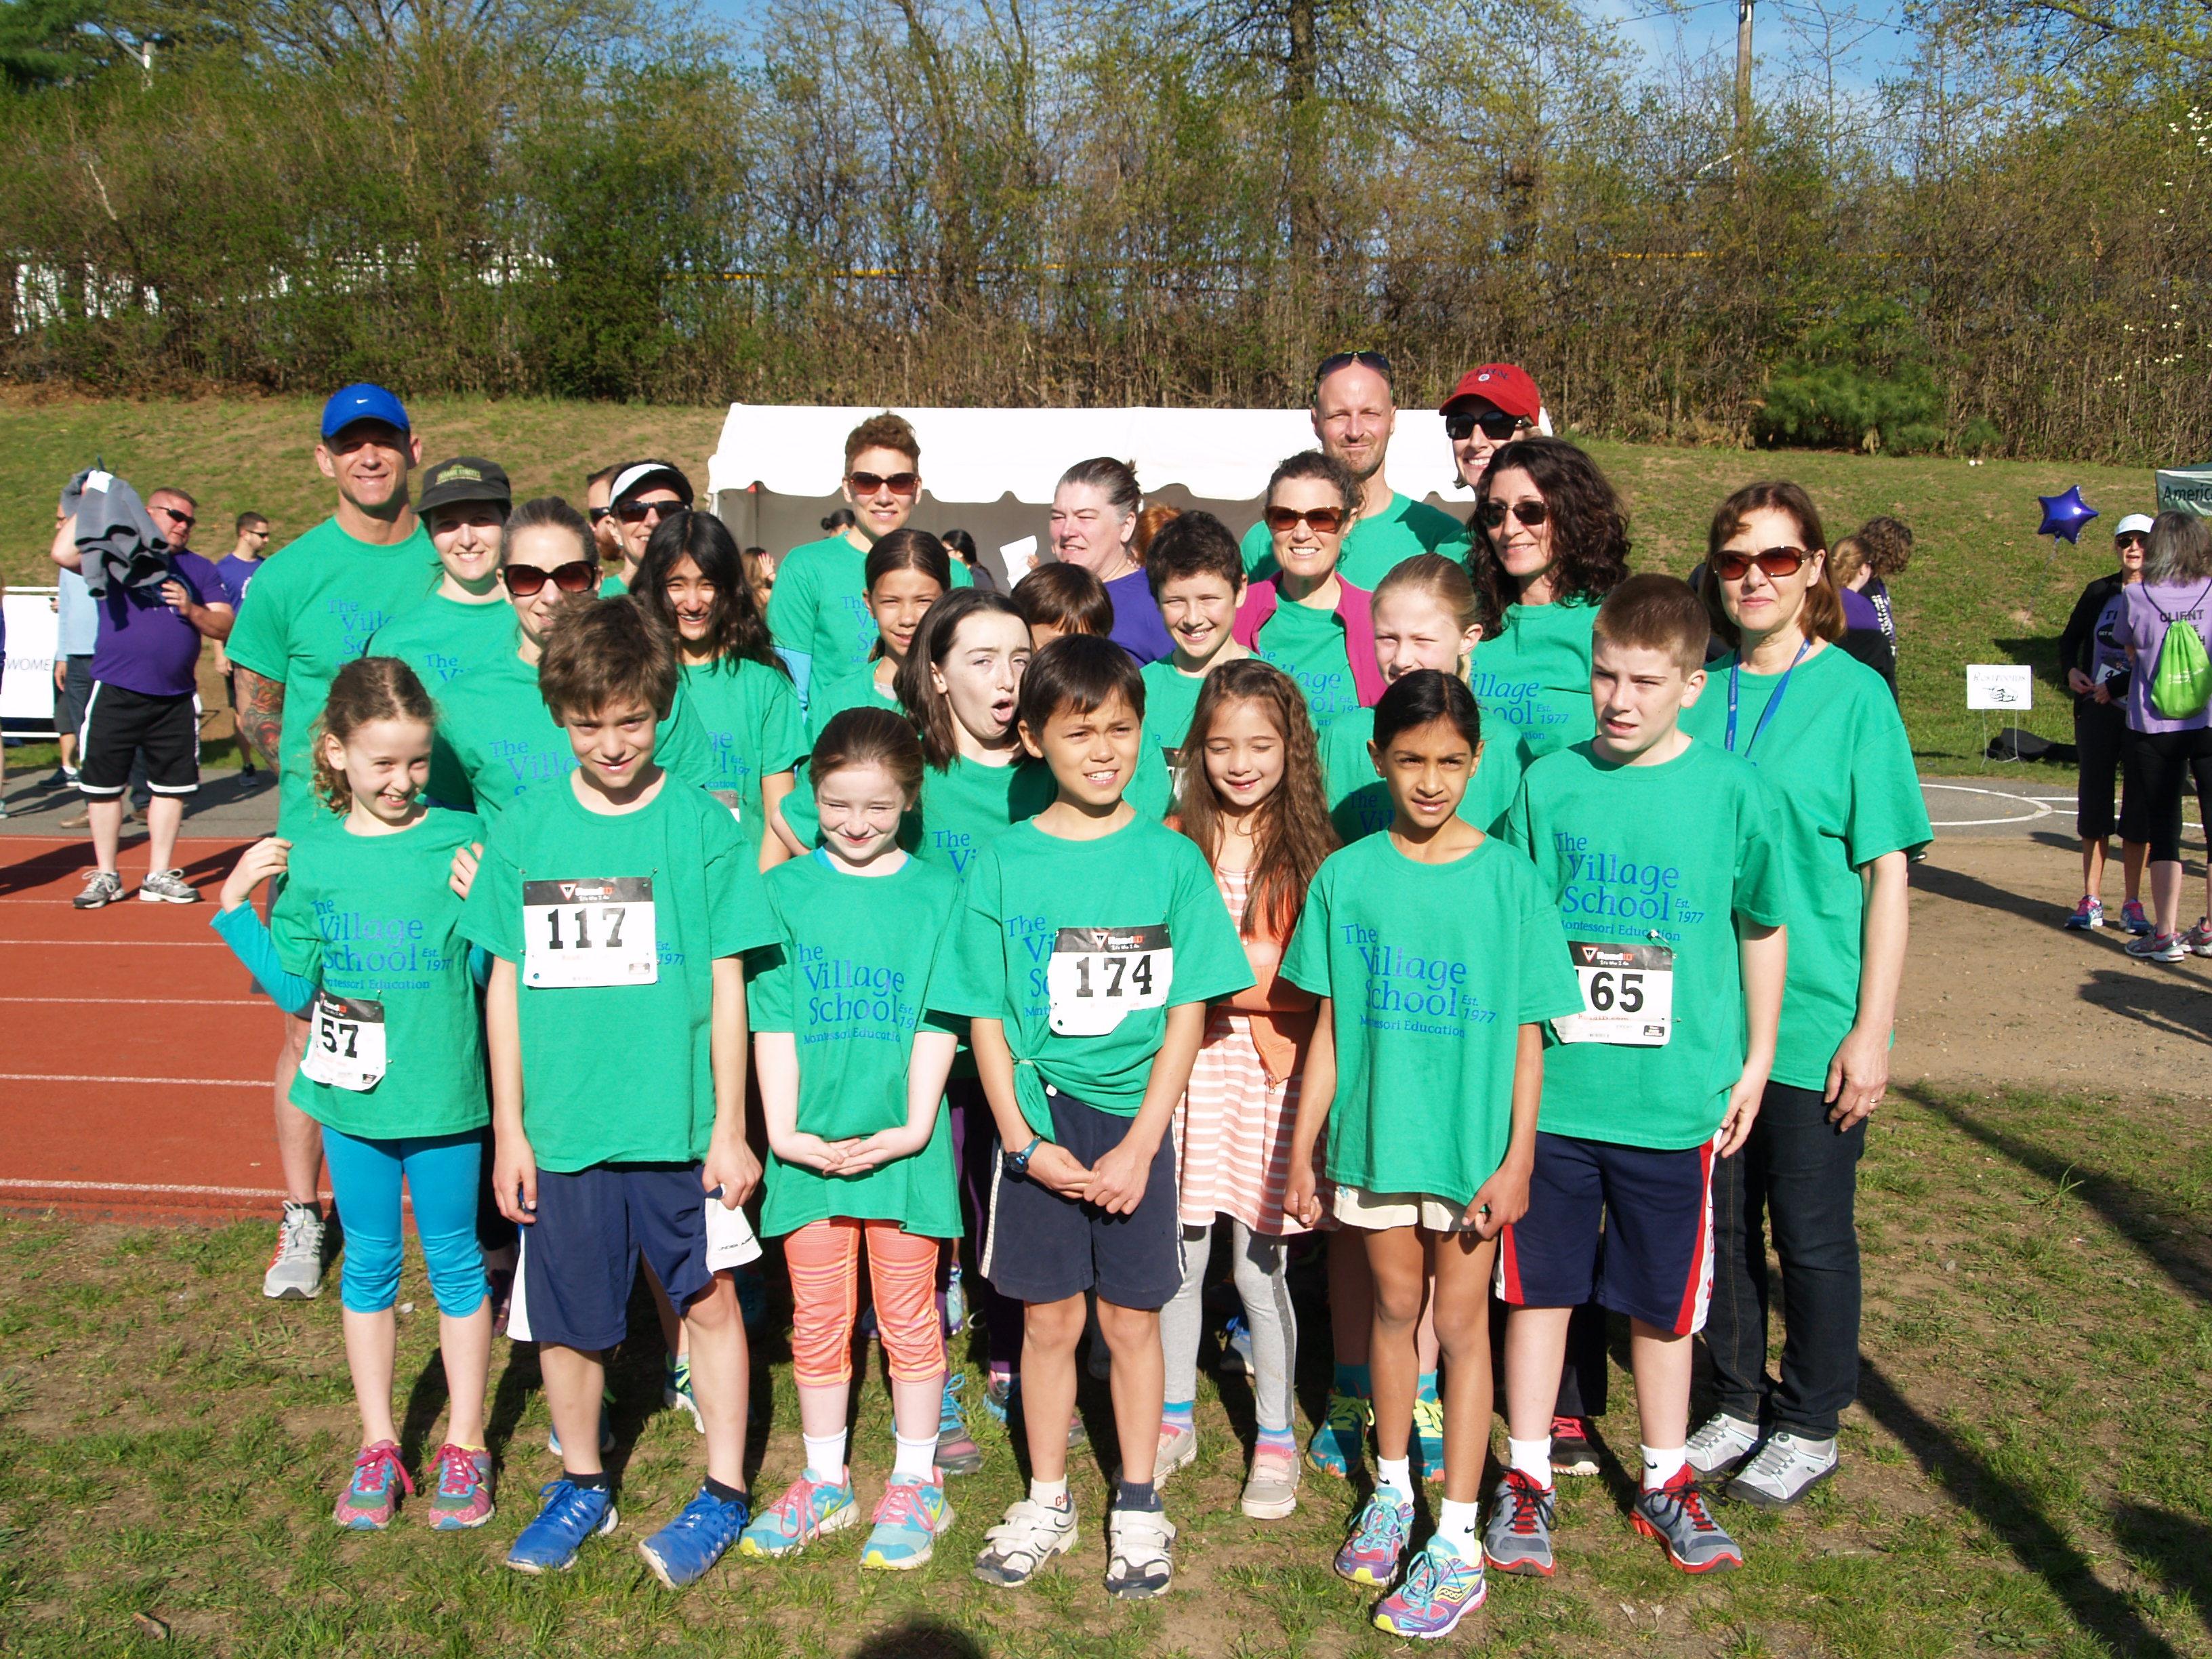 Custom T Shirts For The Village School 5 K Running Team Shirt